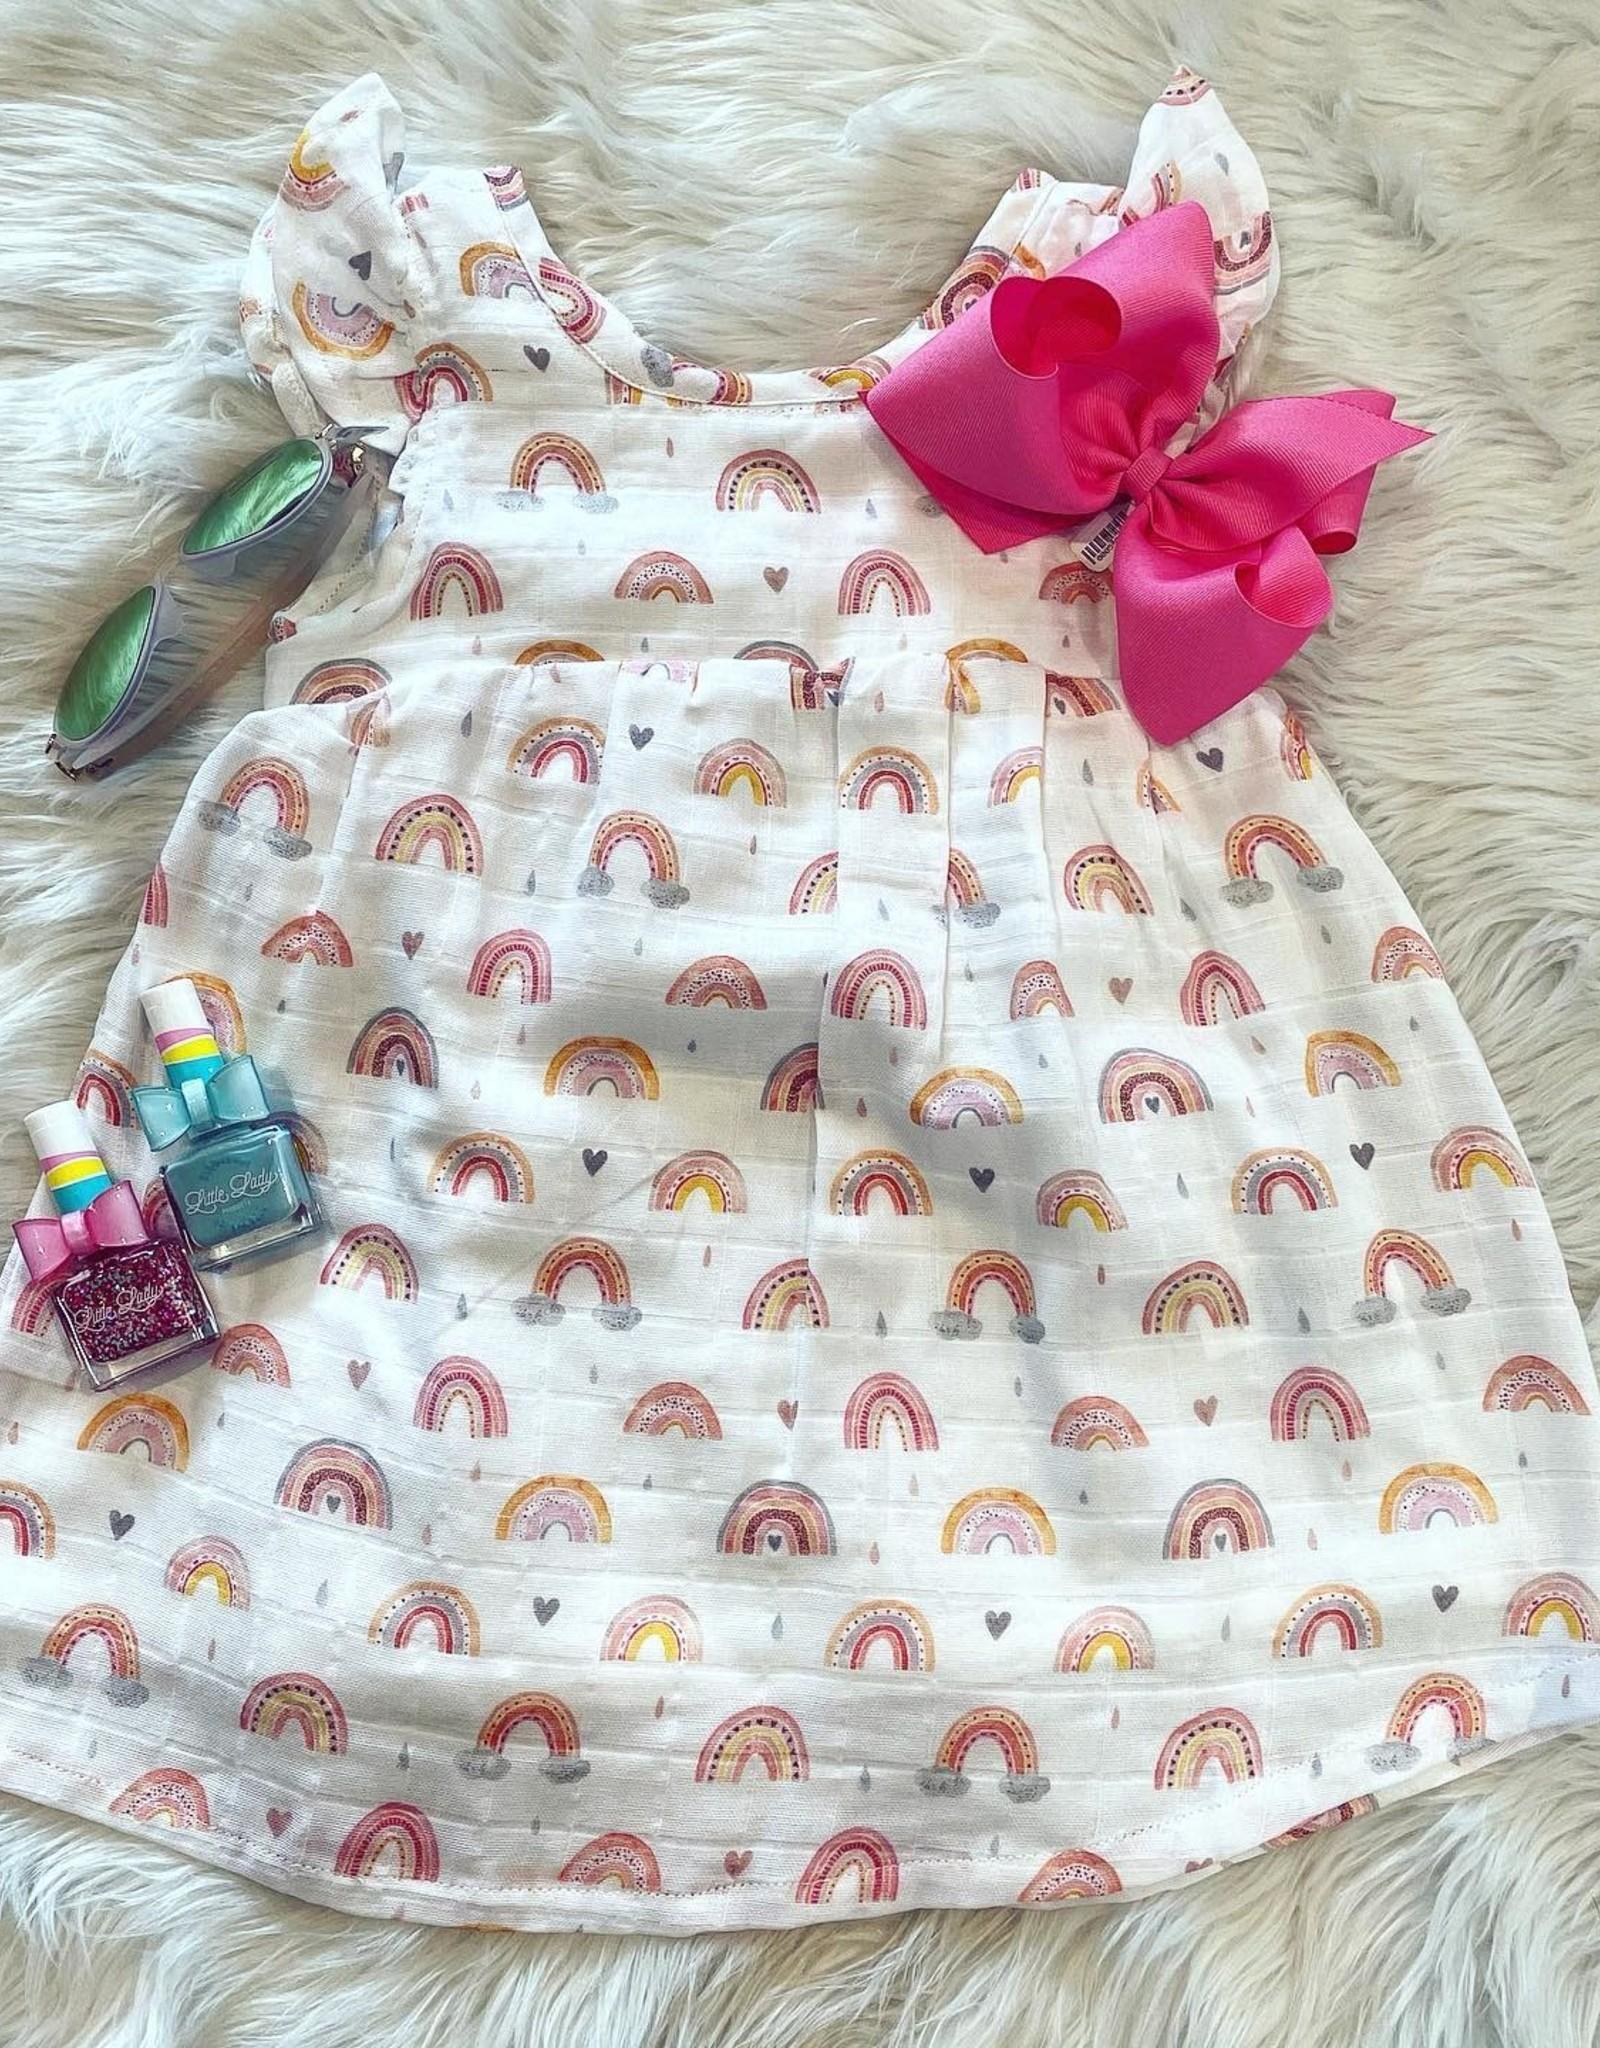 Nola Tawk Chase Rainbows Dress